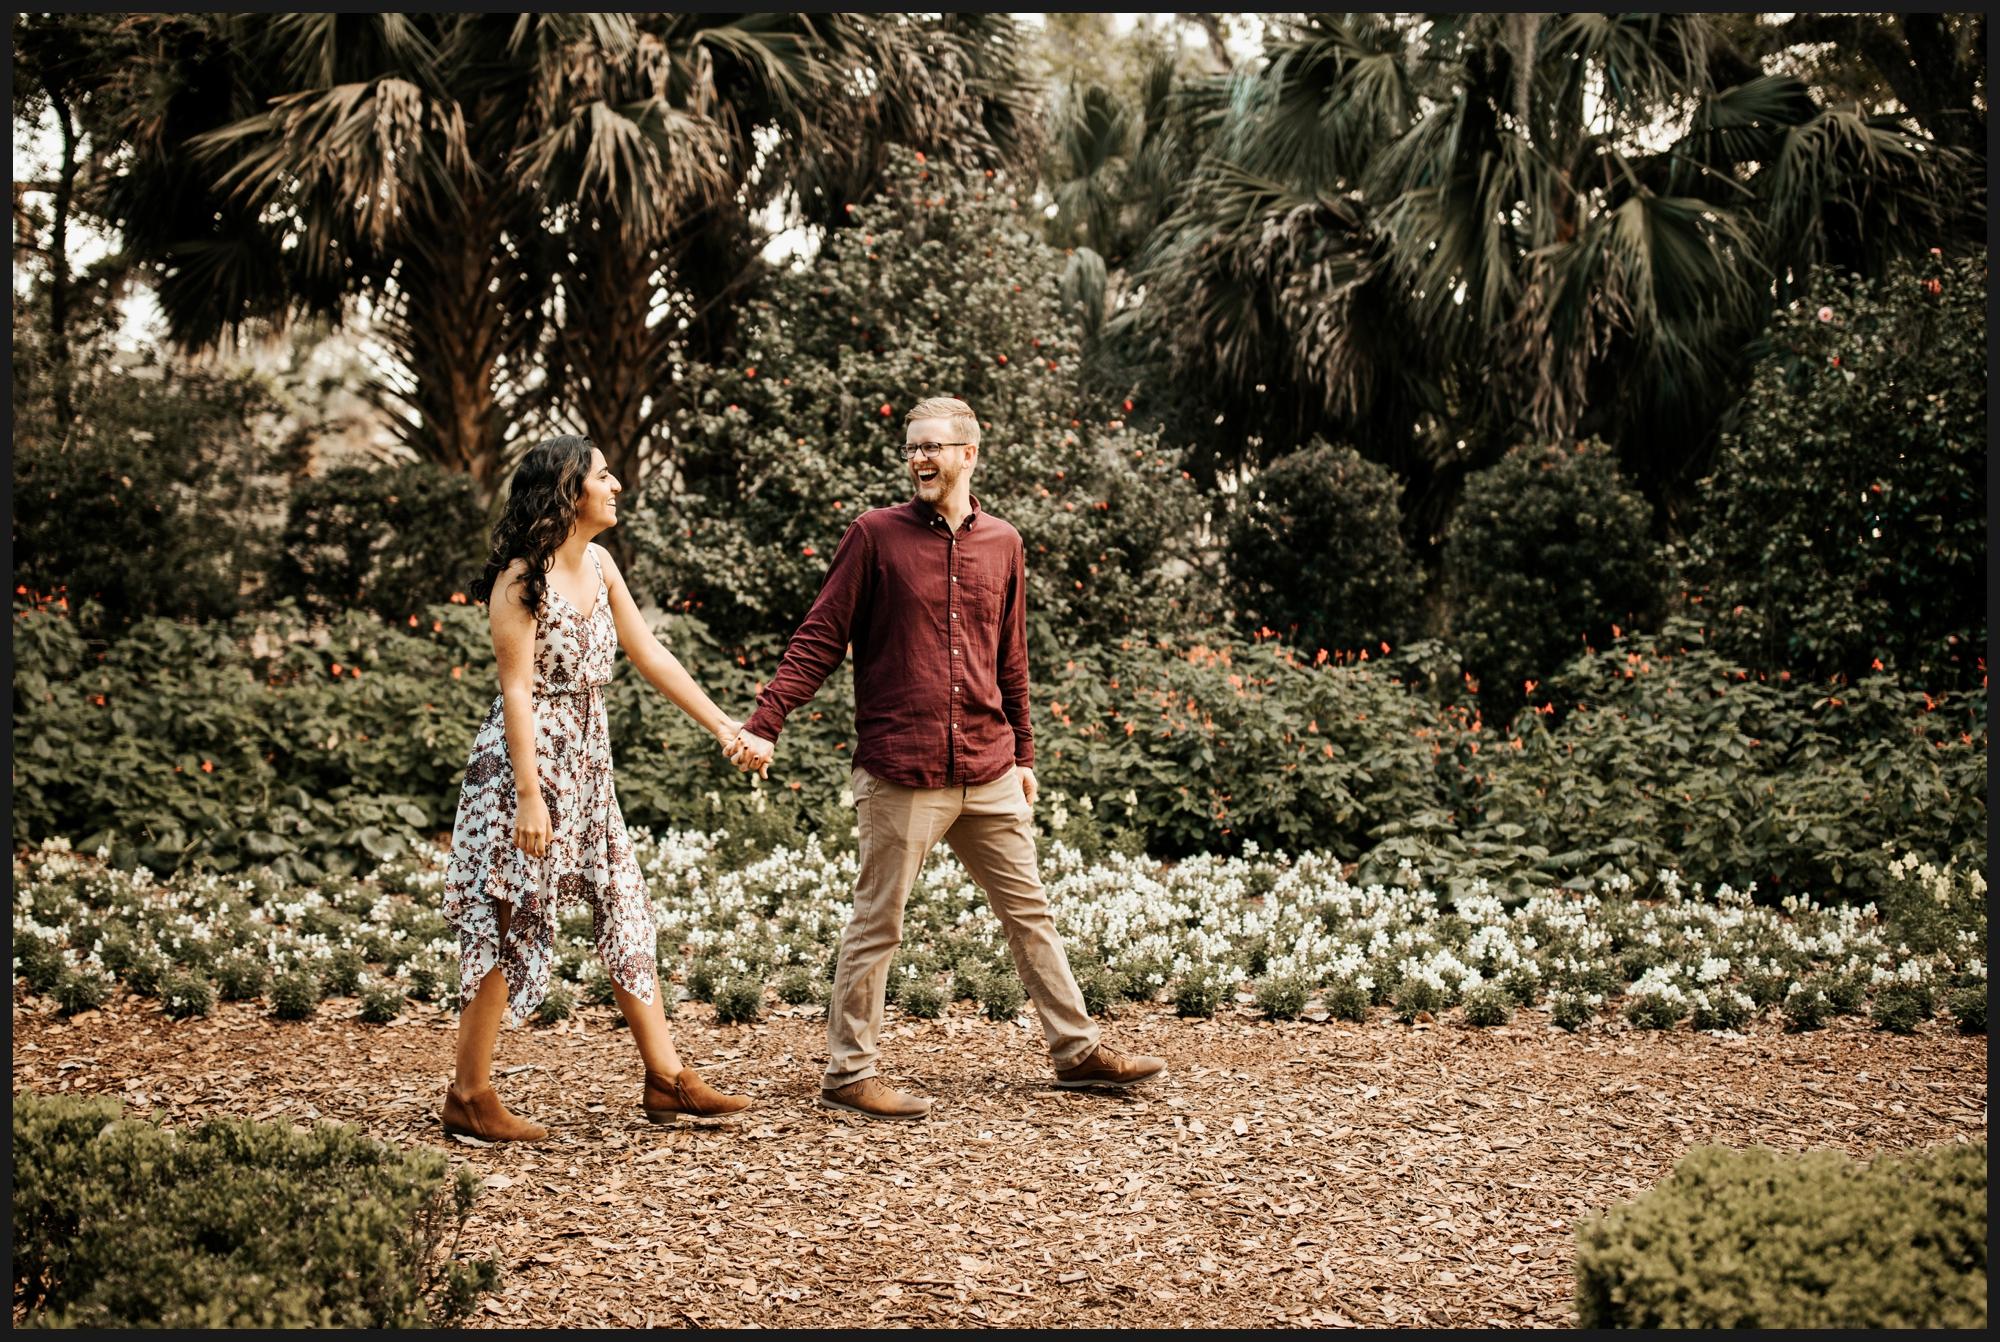 Orlando-Wedding-Photographer-destination-wedding-photographer-florida-wedding-photographer-bohemian-wedding-photographer_1804.jpg